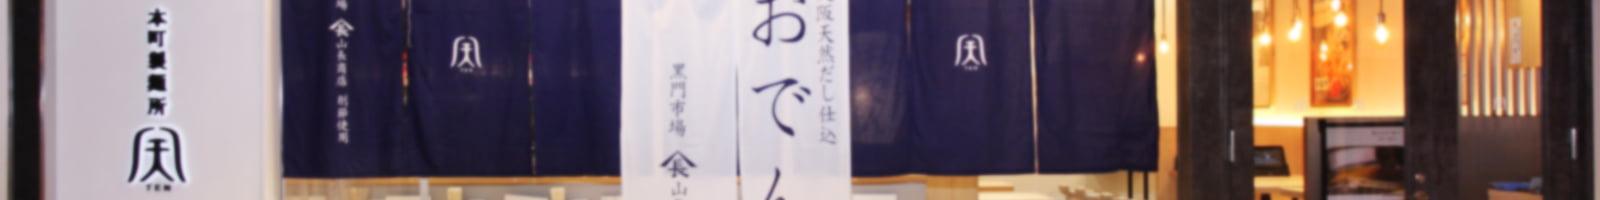 本町製麺所 天 / 天の上